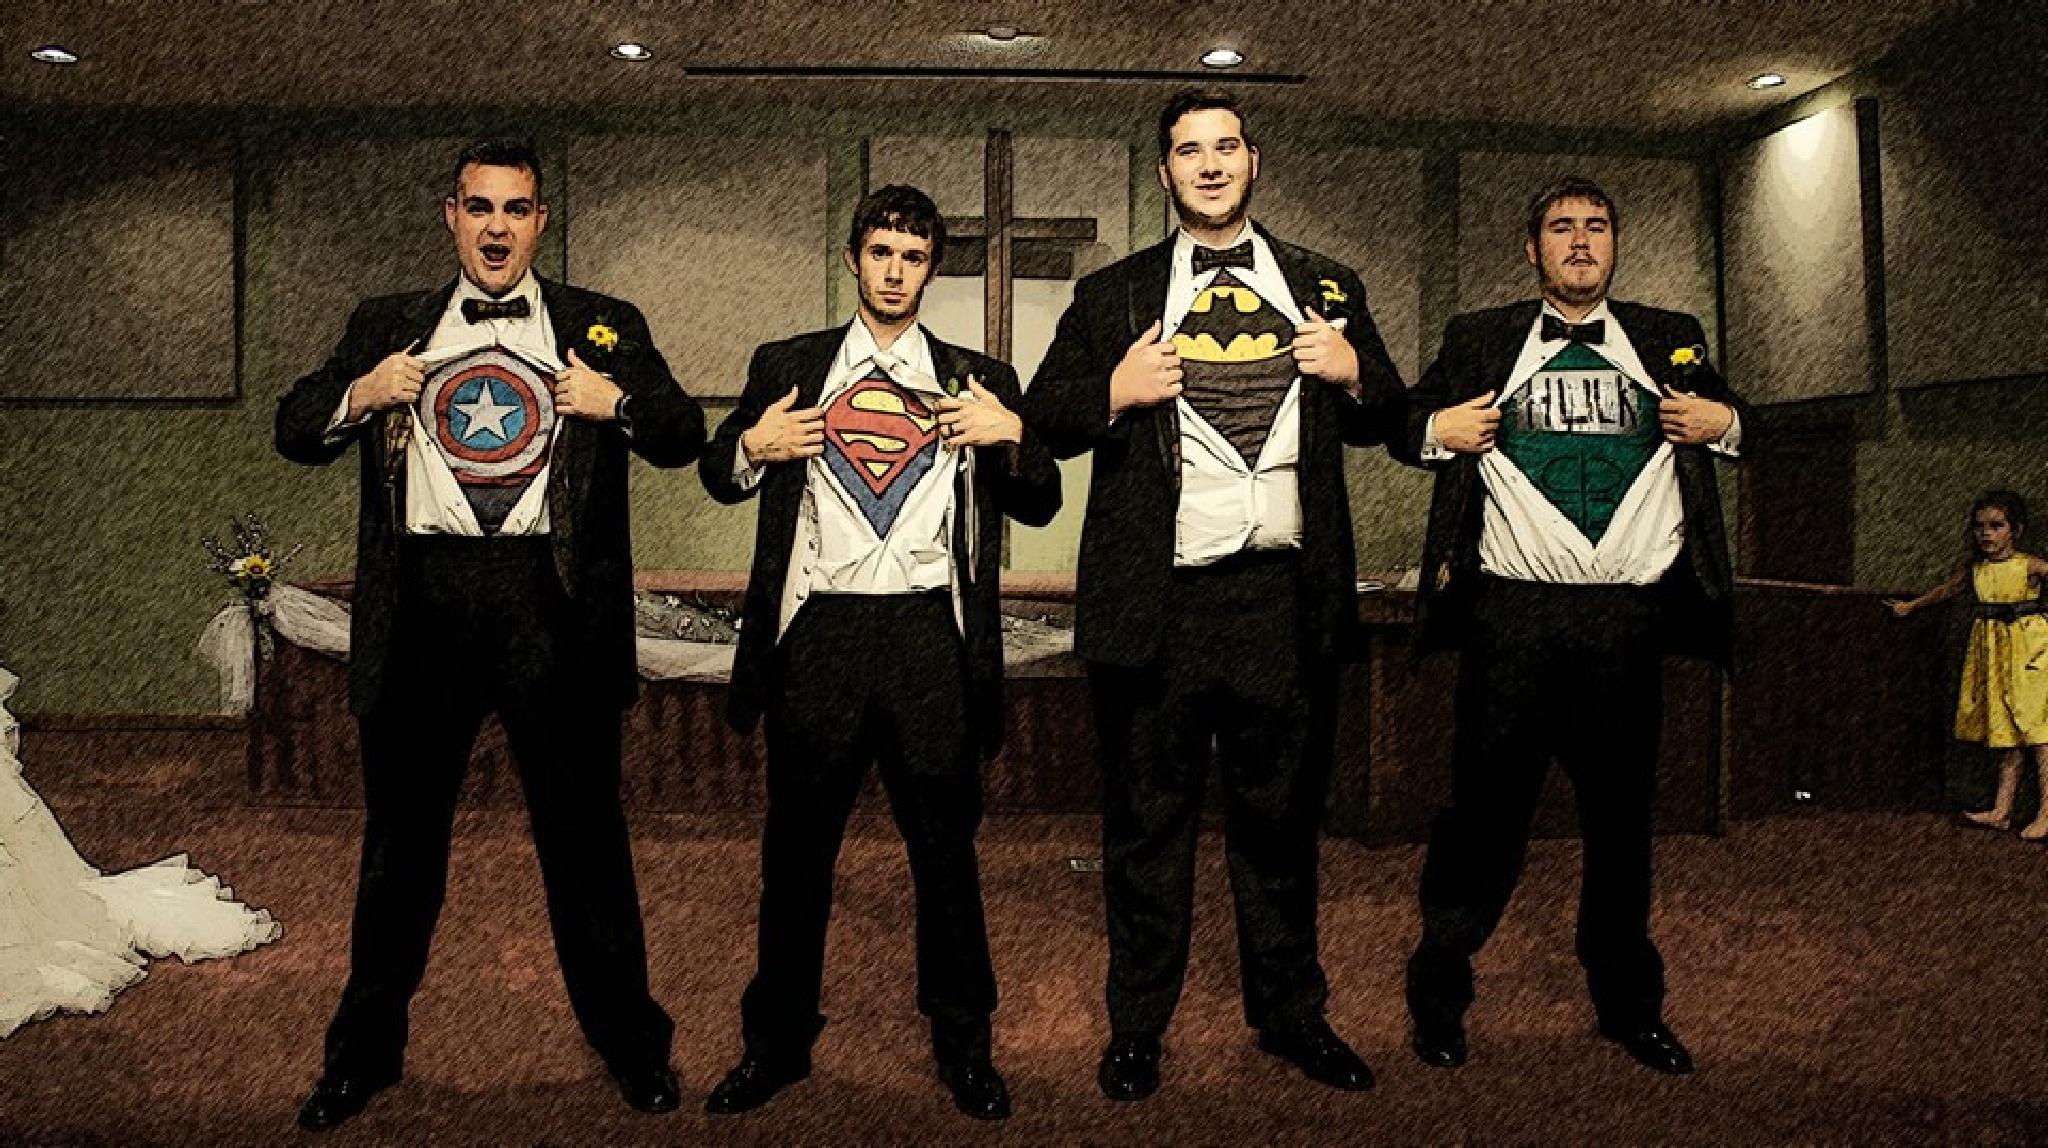 Super Heroic Groom and Groomsmen by thomas.holbrook.33